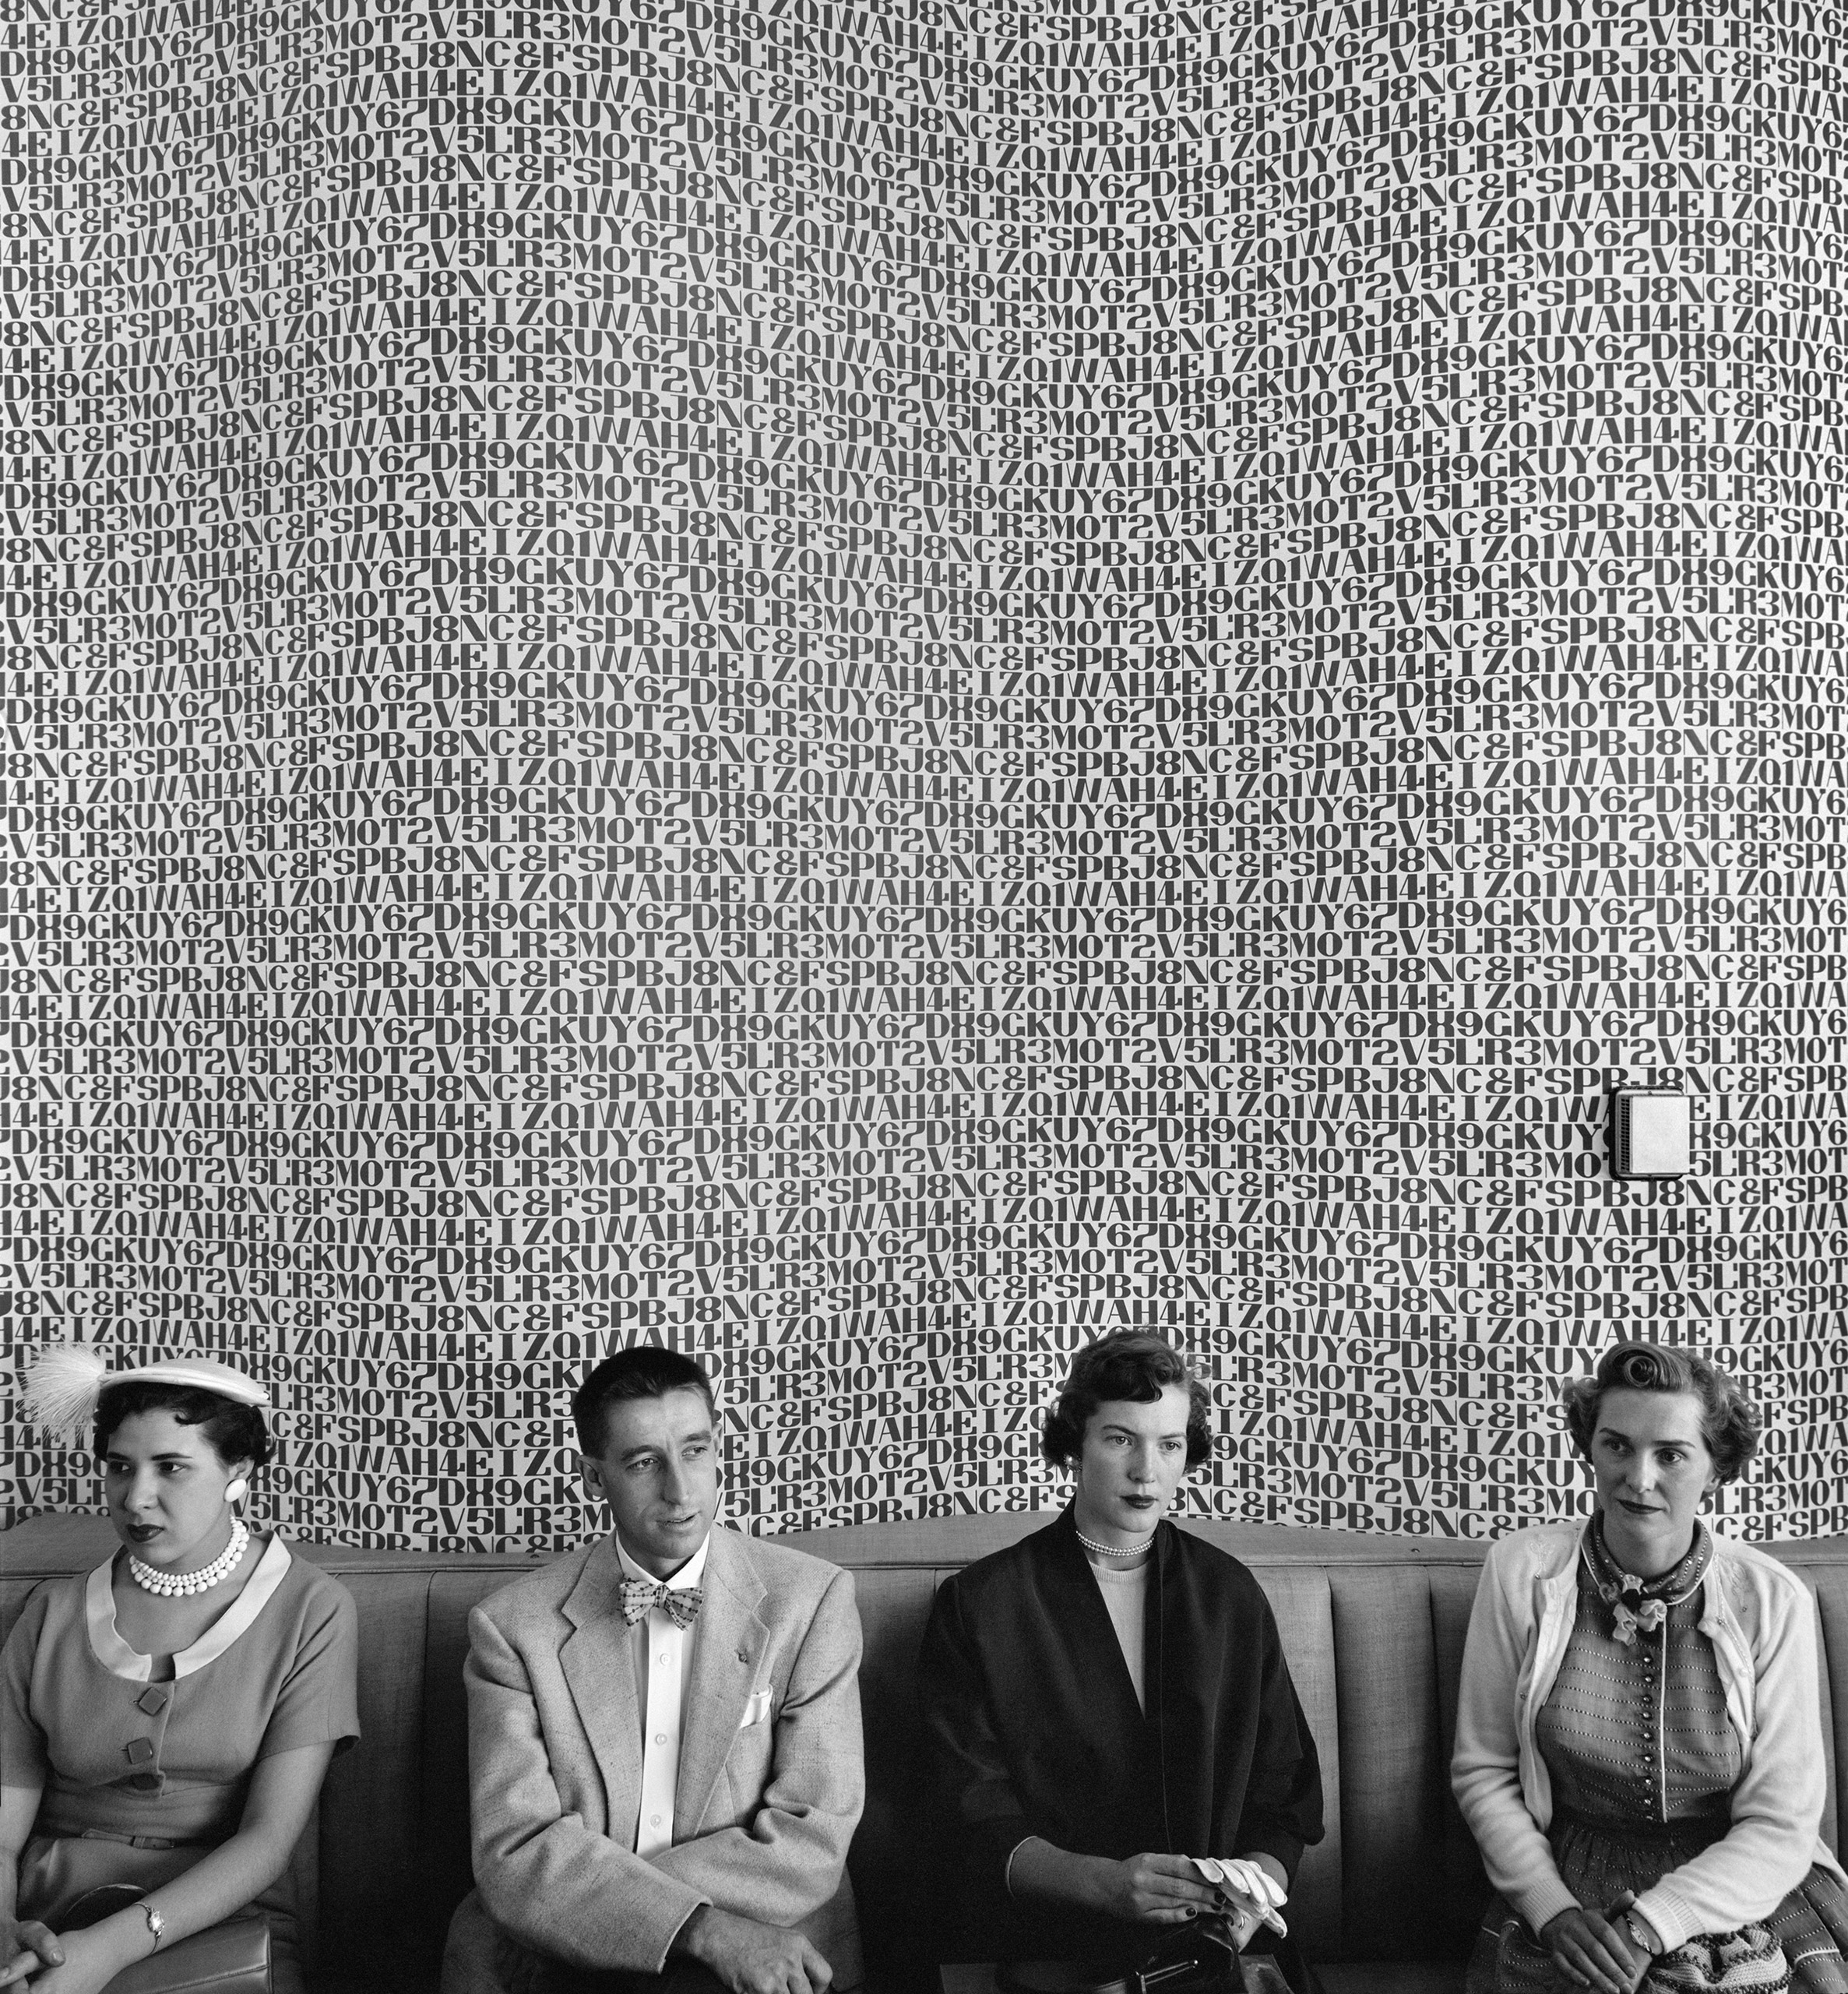 Waiting room, Detroit, Michigan, 1954.